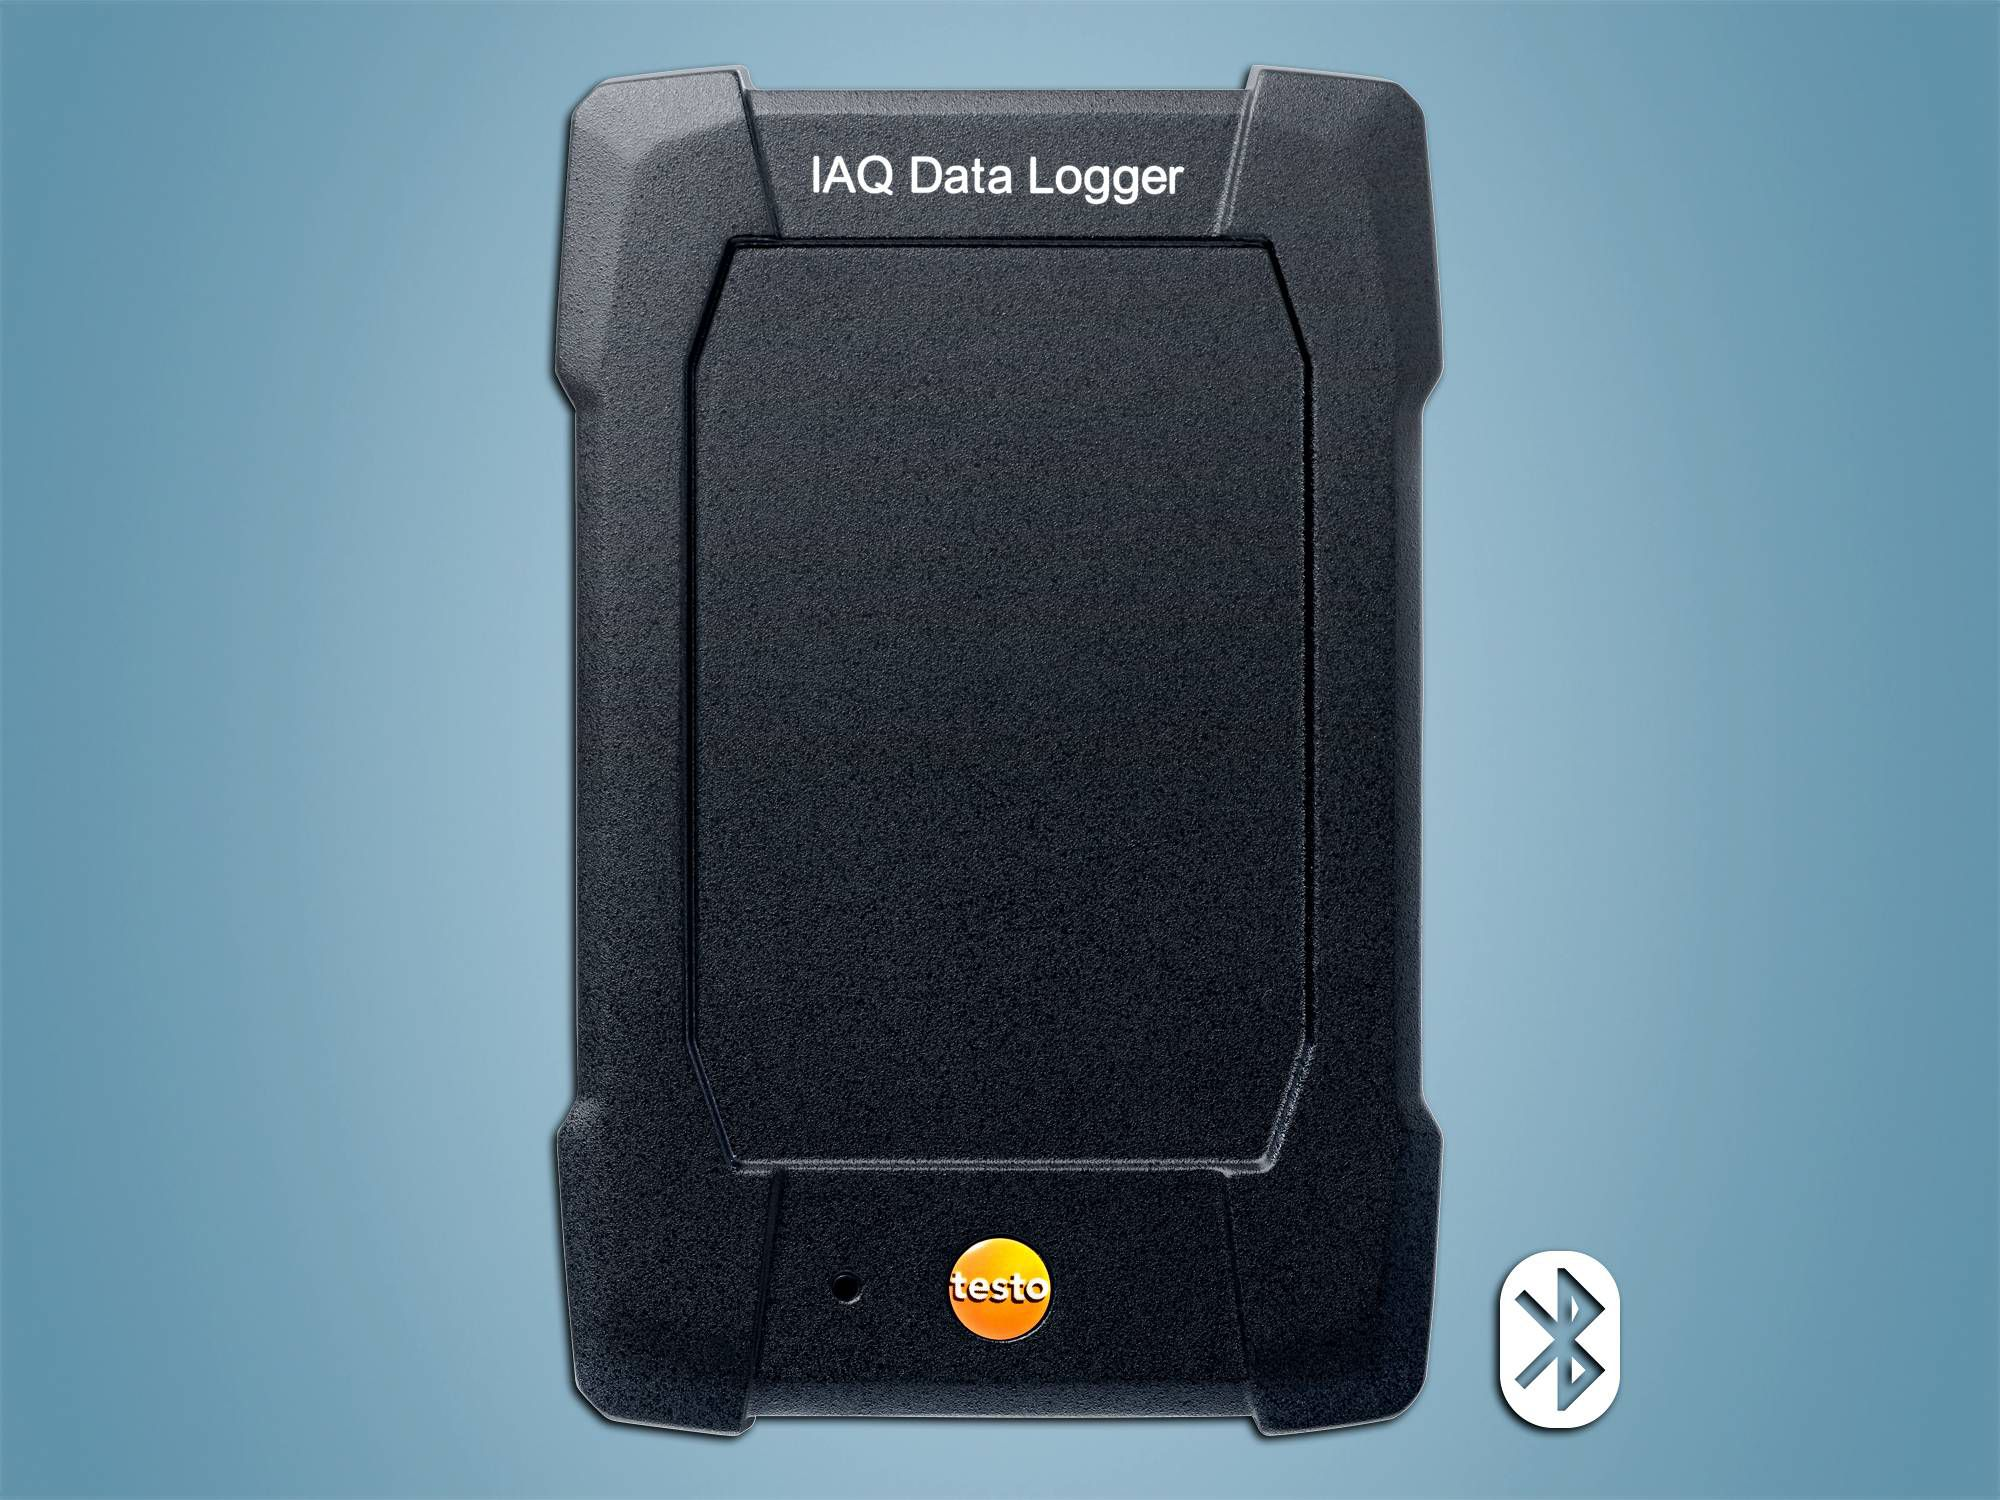 IAQ Datenlogger testo 400